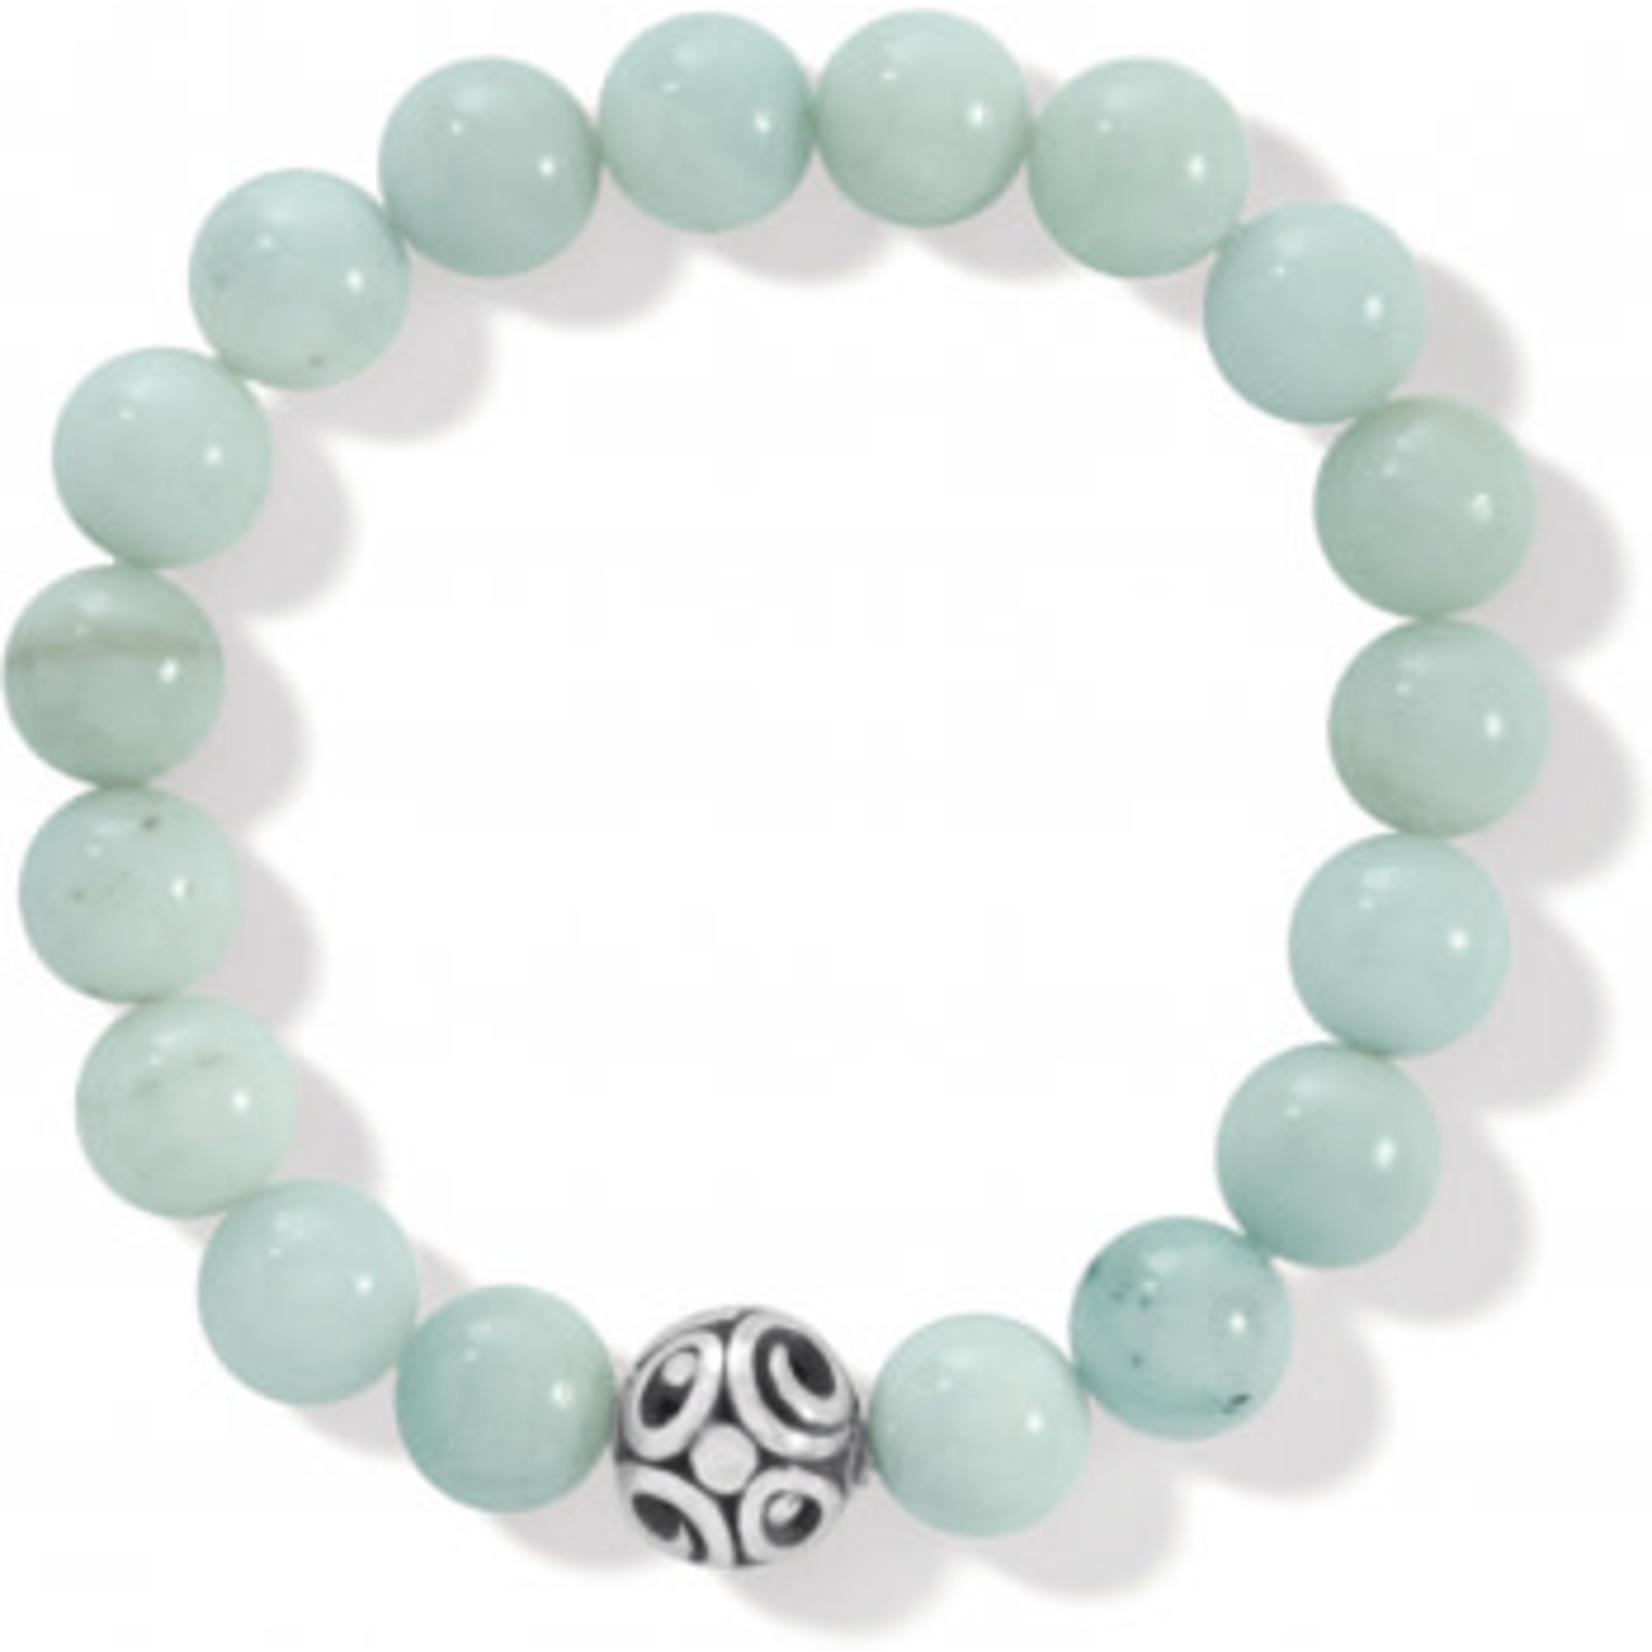 Brighton Contempo Chroma Amazonite Stretch Bracelet